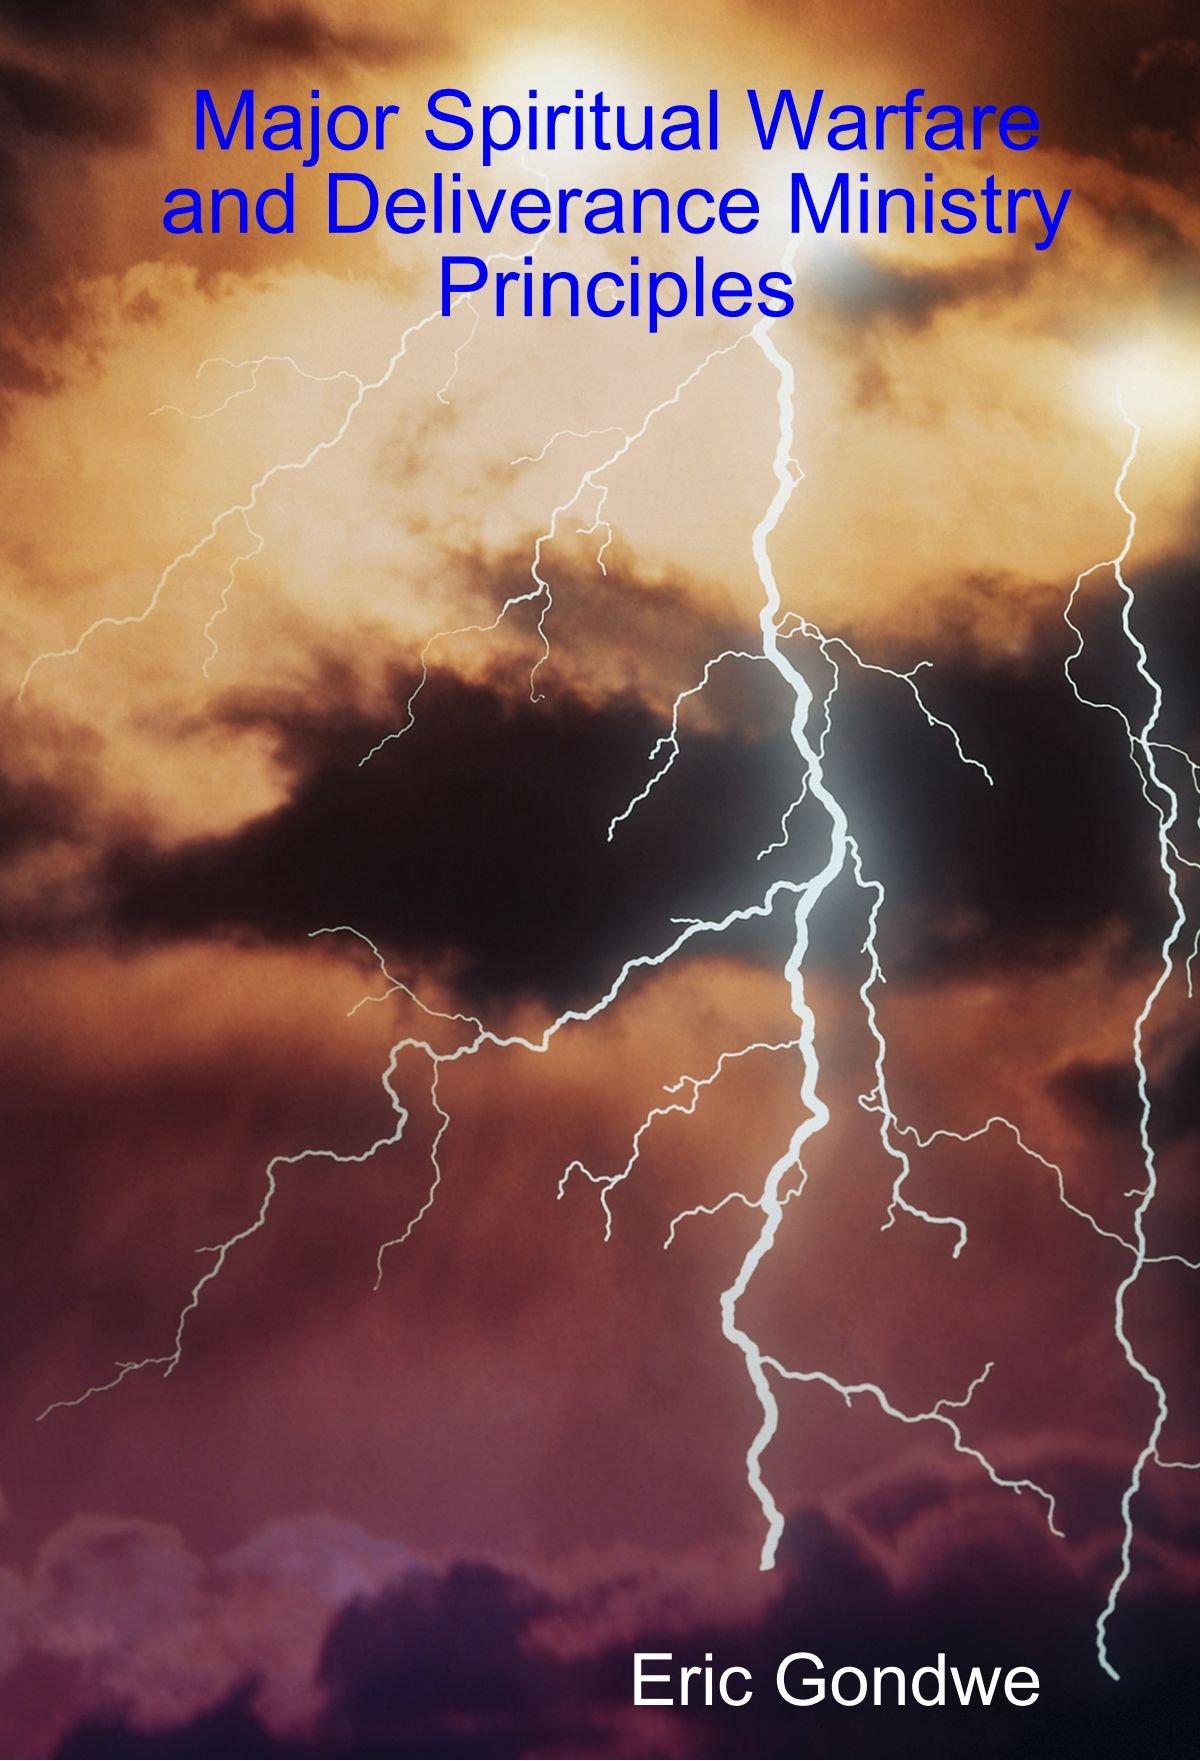 Major Spiritual Warfare and Deliverance Ministry Principles: Eric